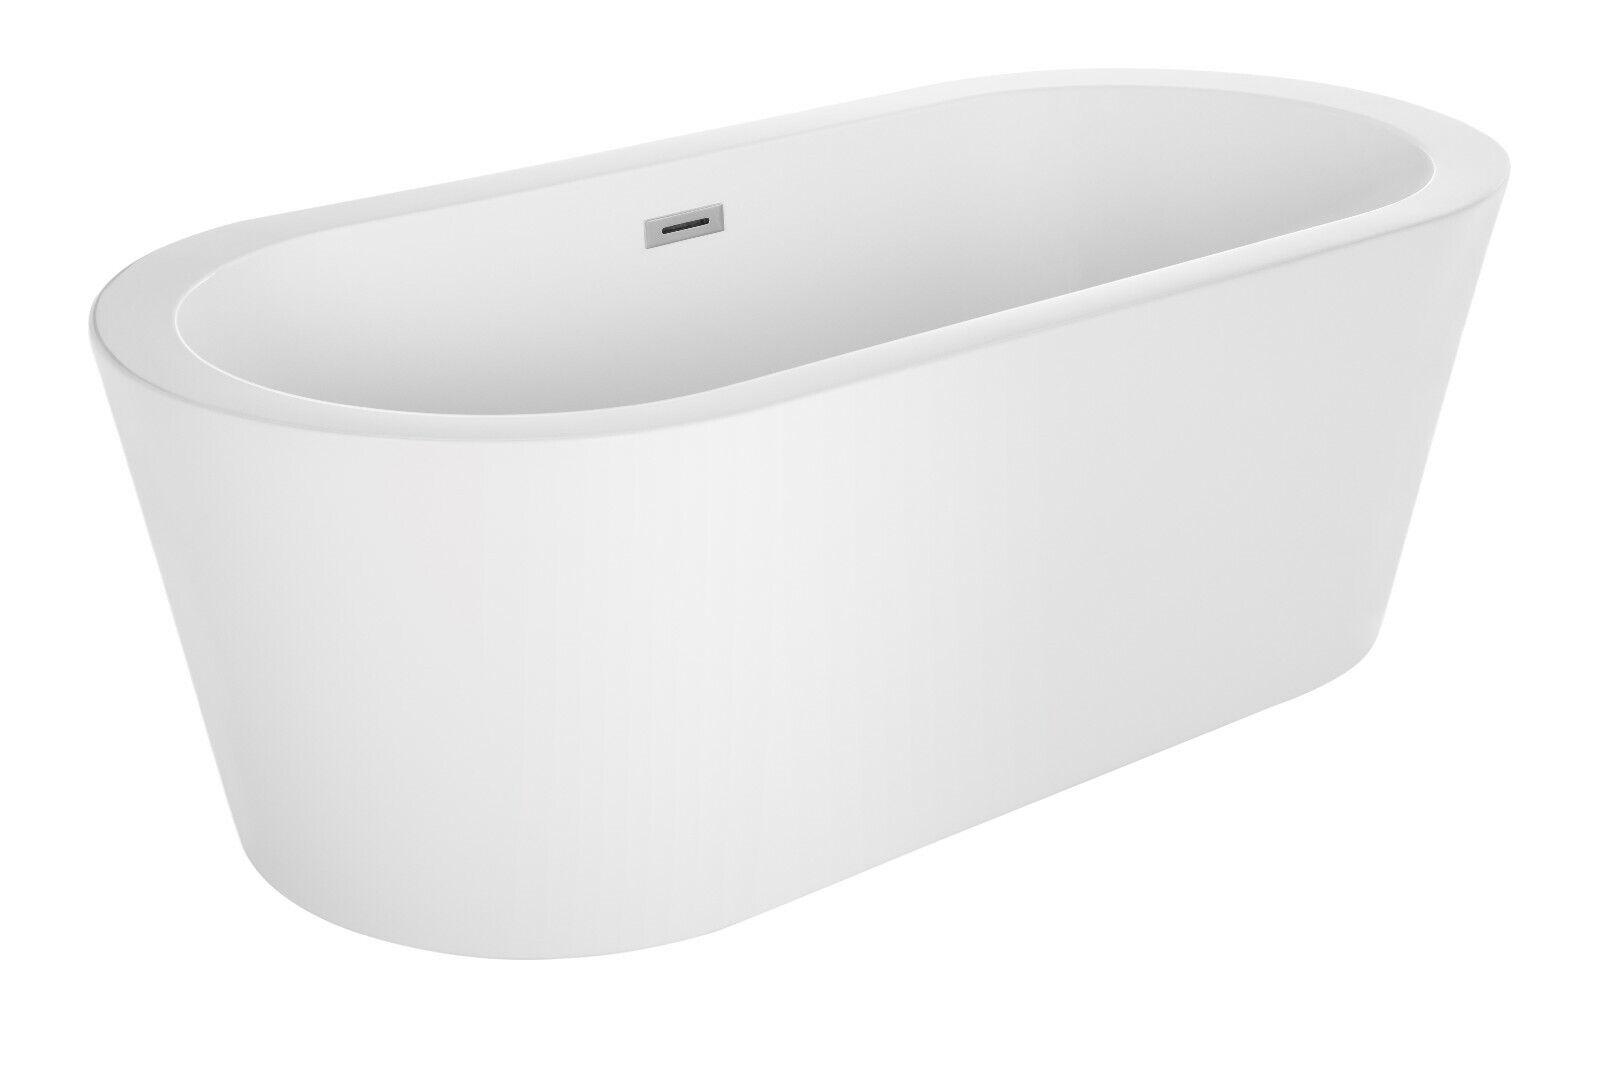 67 Luxury 2 Person Bathtub Bathroom Freestanding White Acrylic Oval Soaking Tub